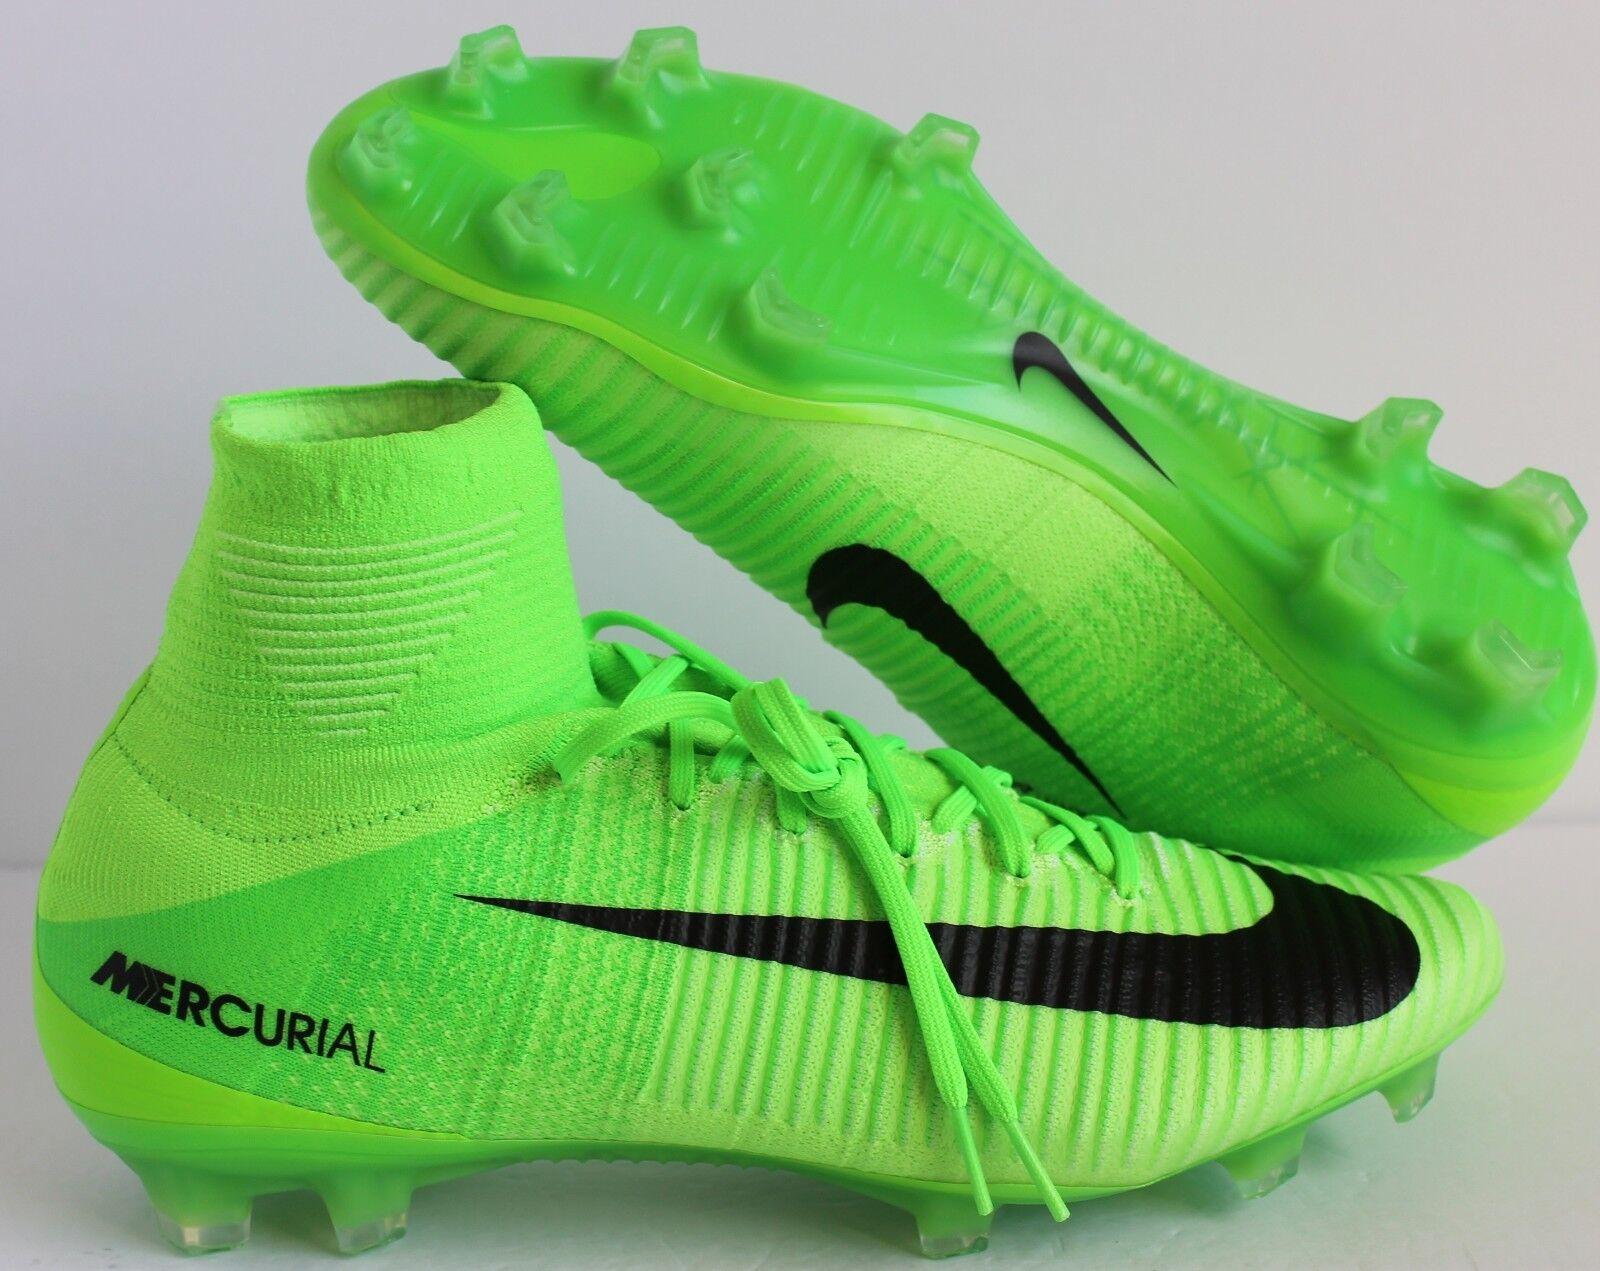 Para Hombre Nike Mercurial Superfly V FG Color verde ELÉCTRICO-NEGRO Talla 6 [831940-305]